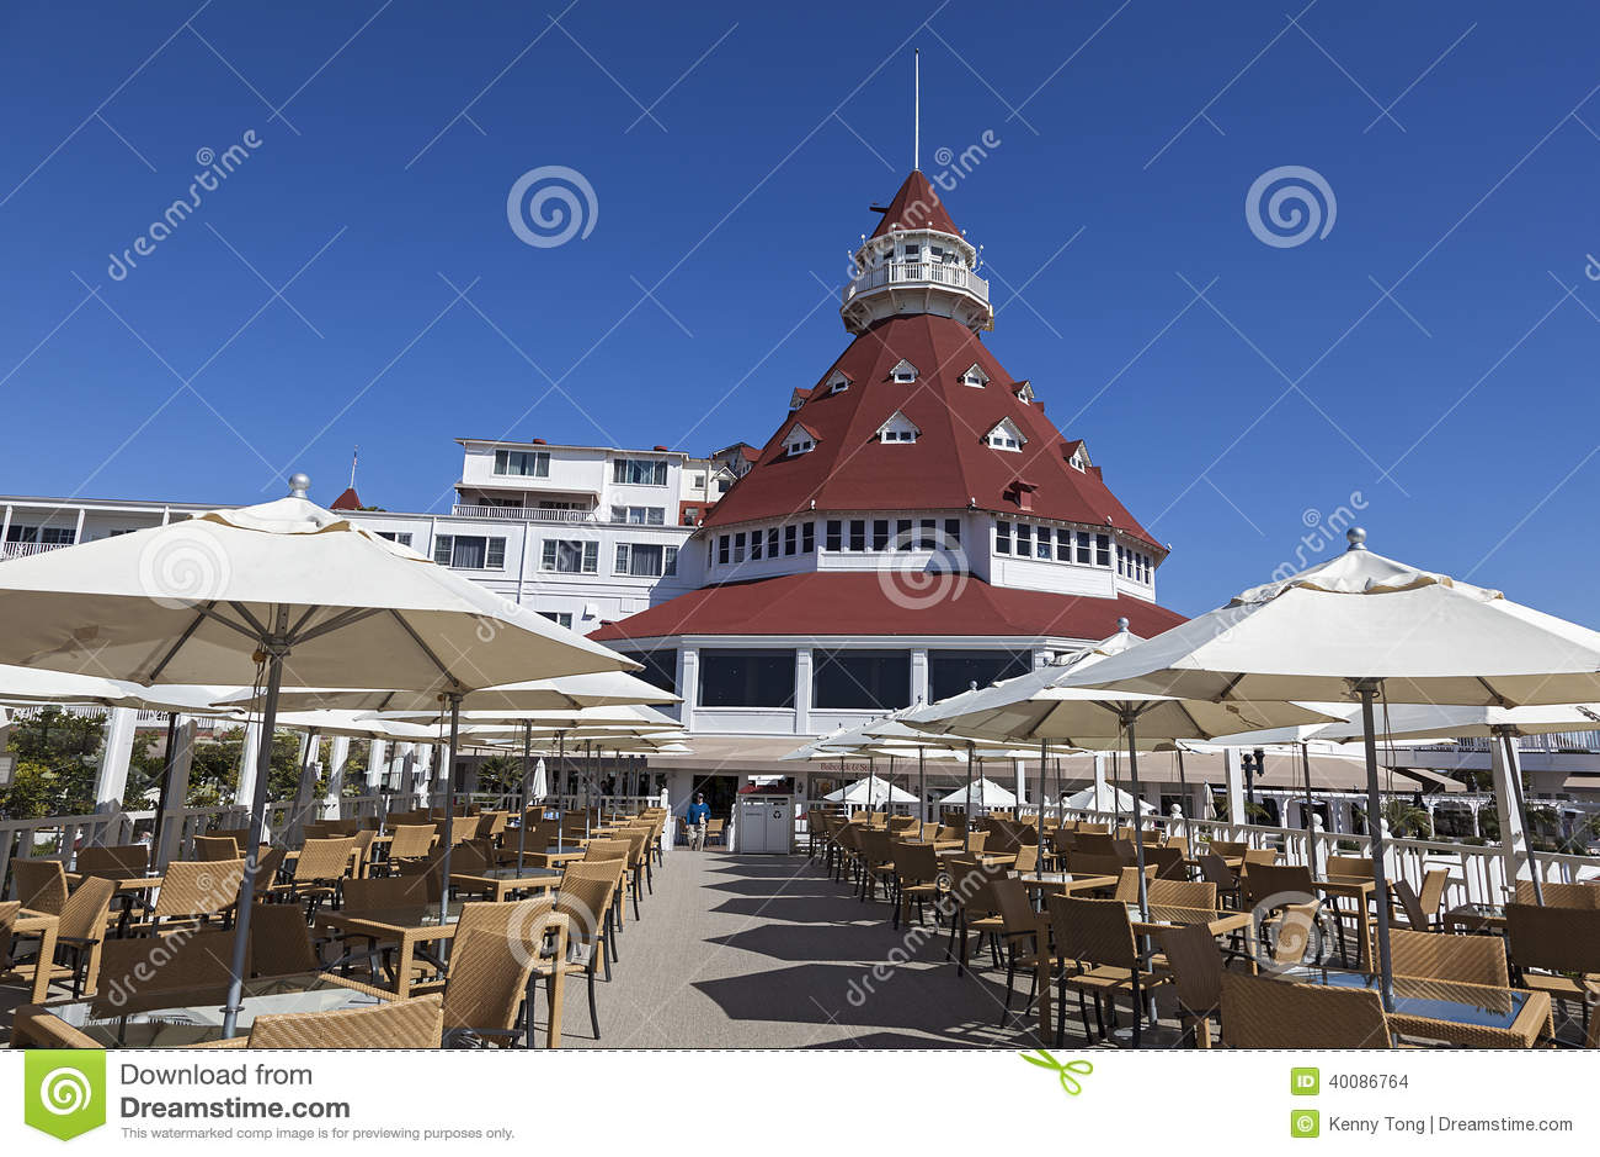 68 Best The Legendary Del images | Hotel del coronado ...